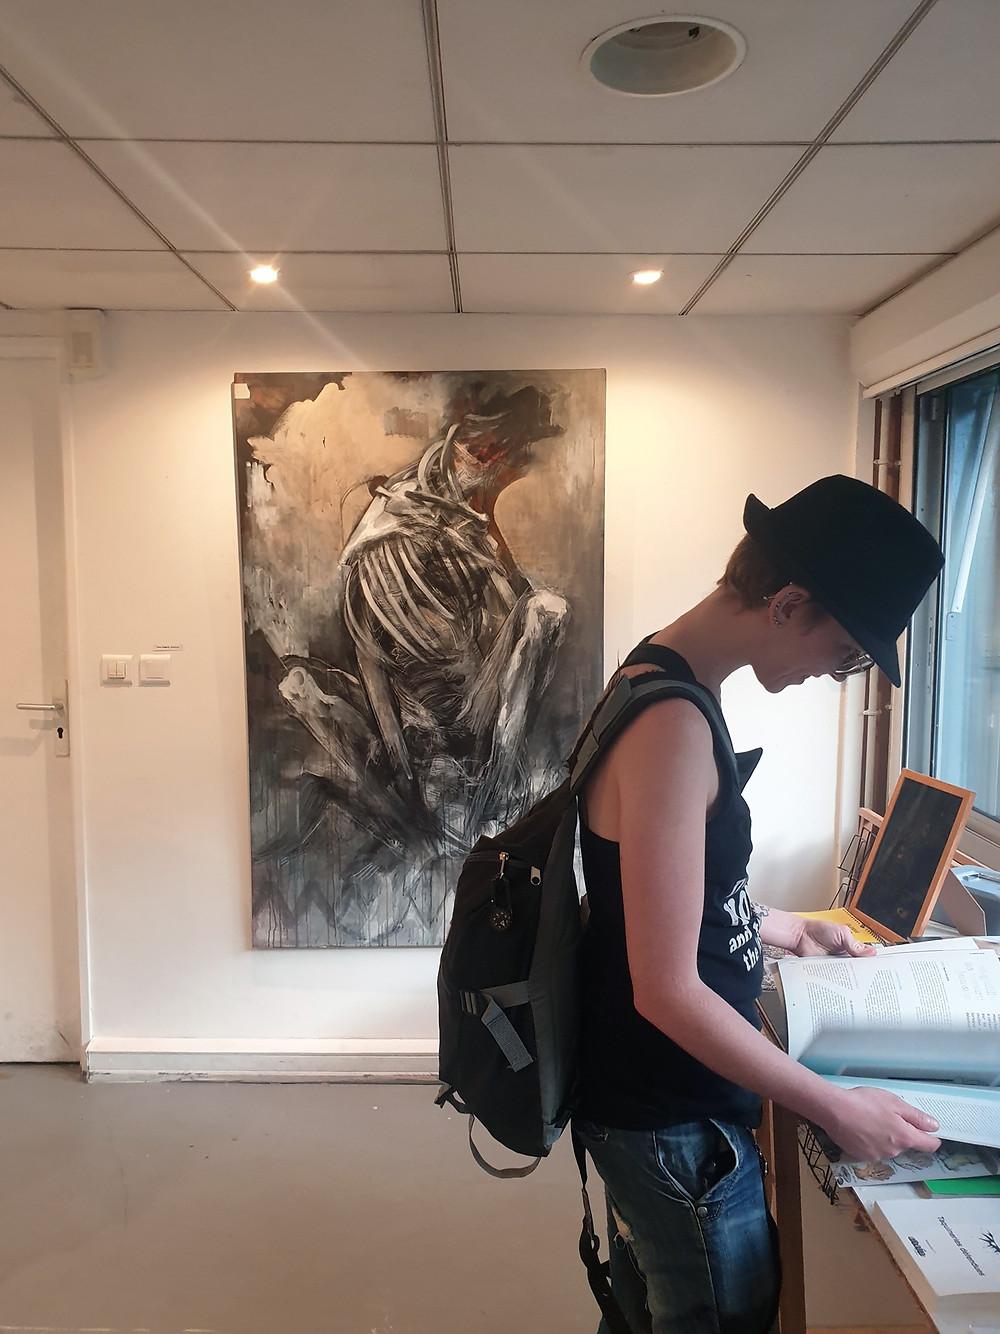 Carcasse, OpenBack gallery, Paris, France_ September 2019